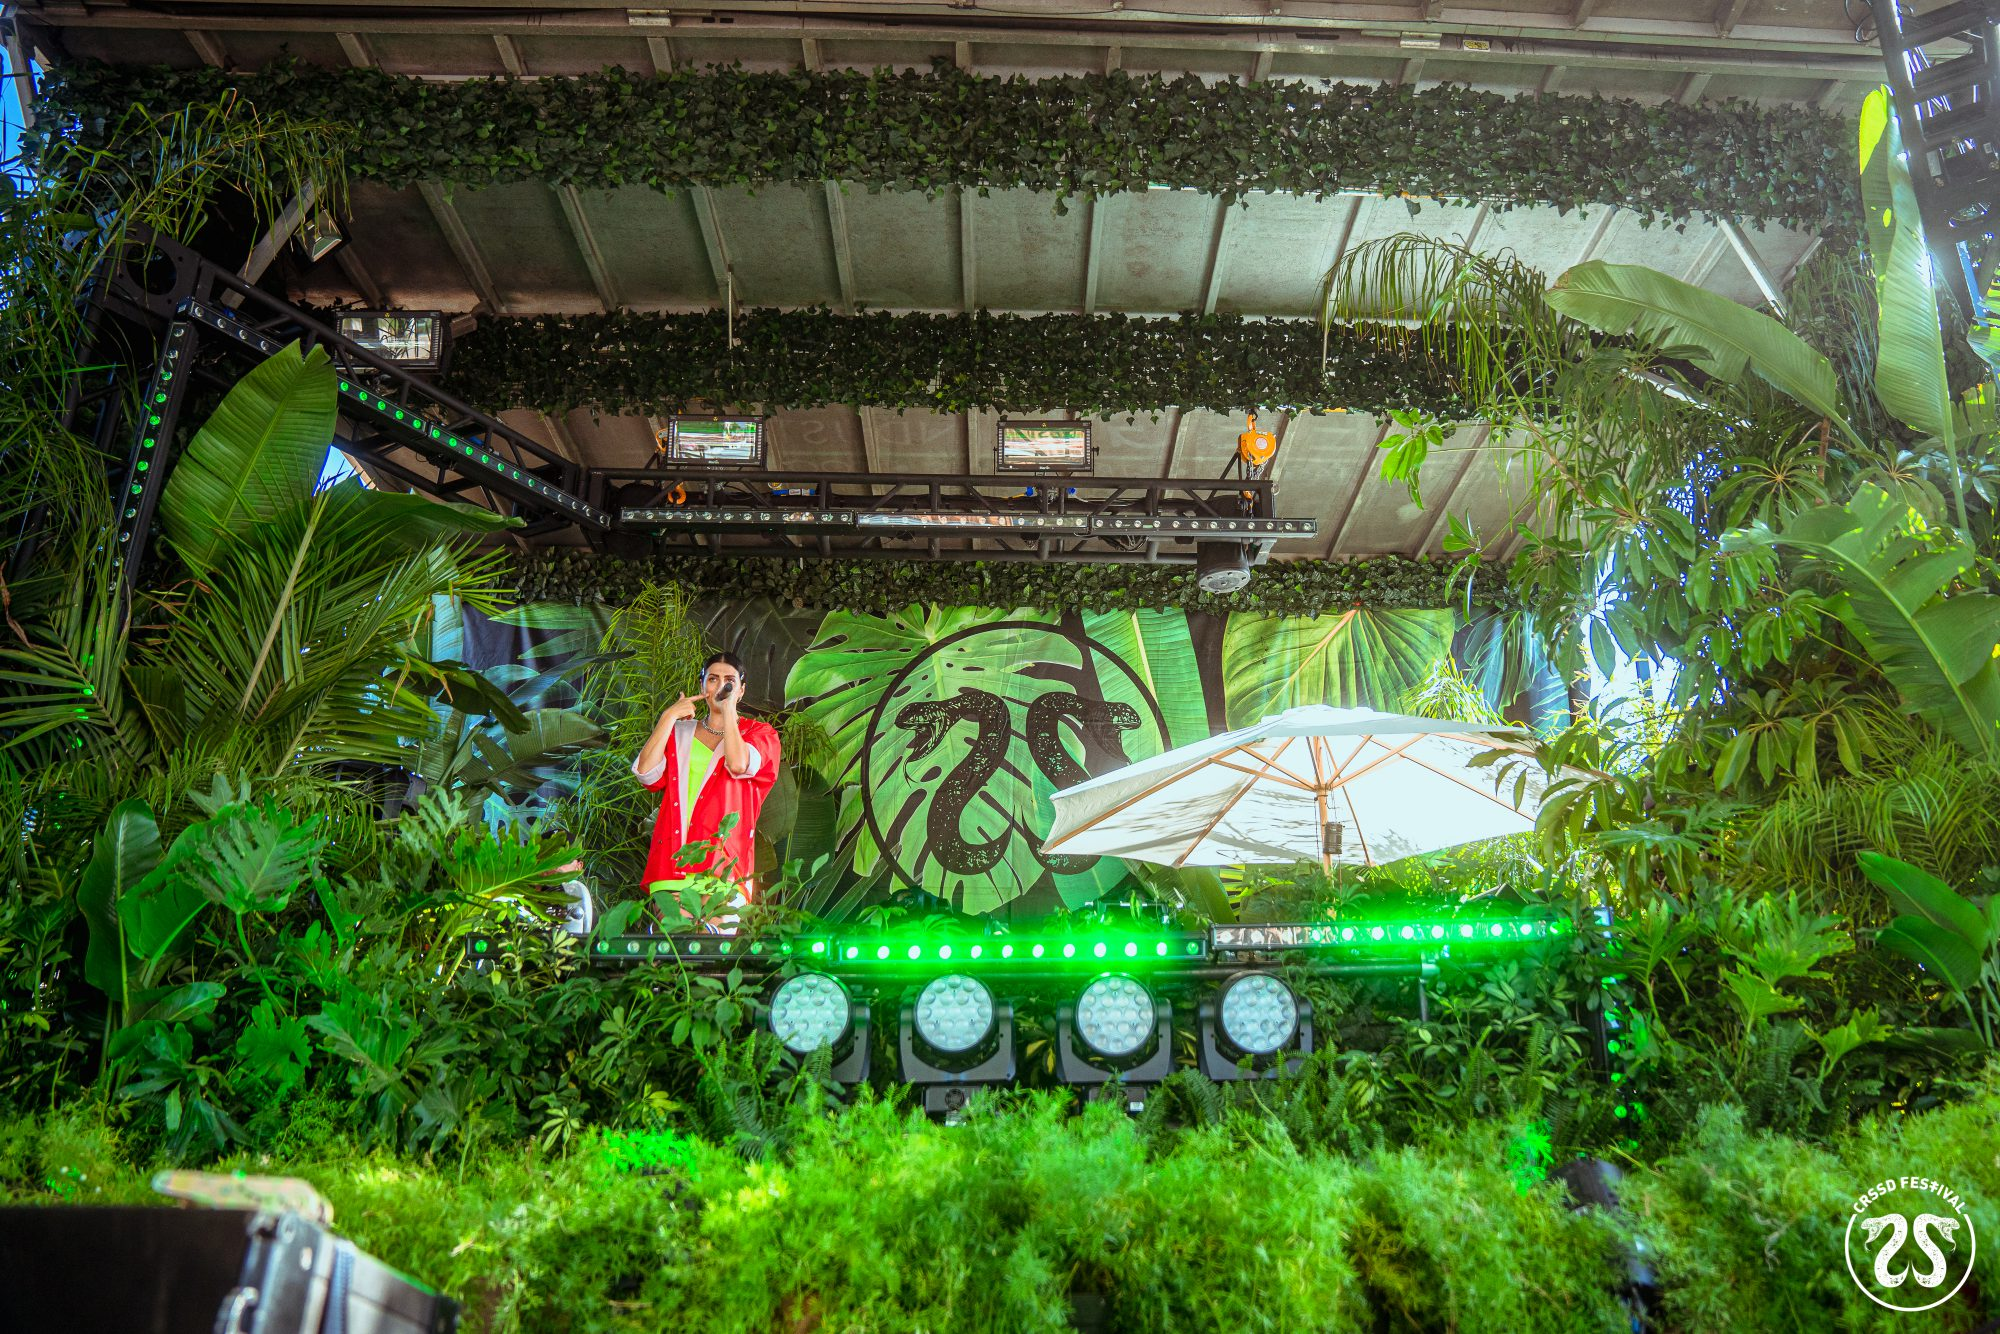 CRSSD Festival Fall 2019 Anna Lunoe